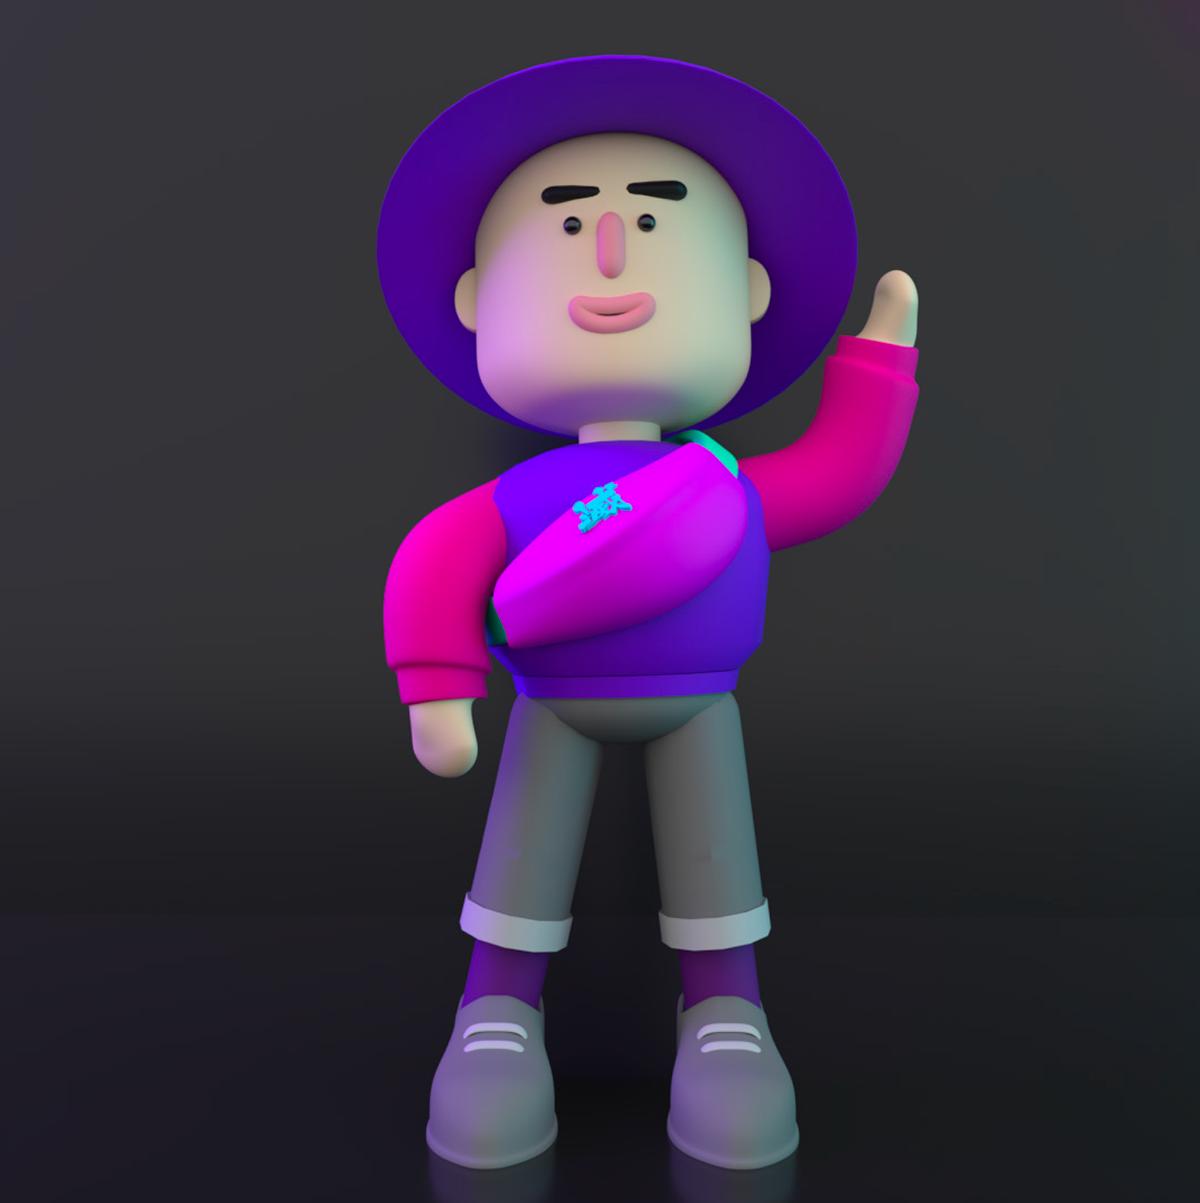 3D animation  c4d characters communicationdesign Cyberpunk design hongkong Neonlight singleparentfamily